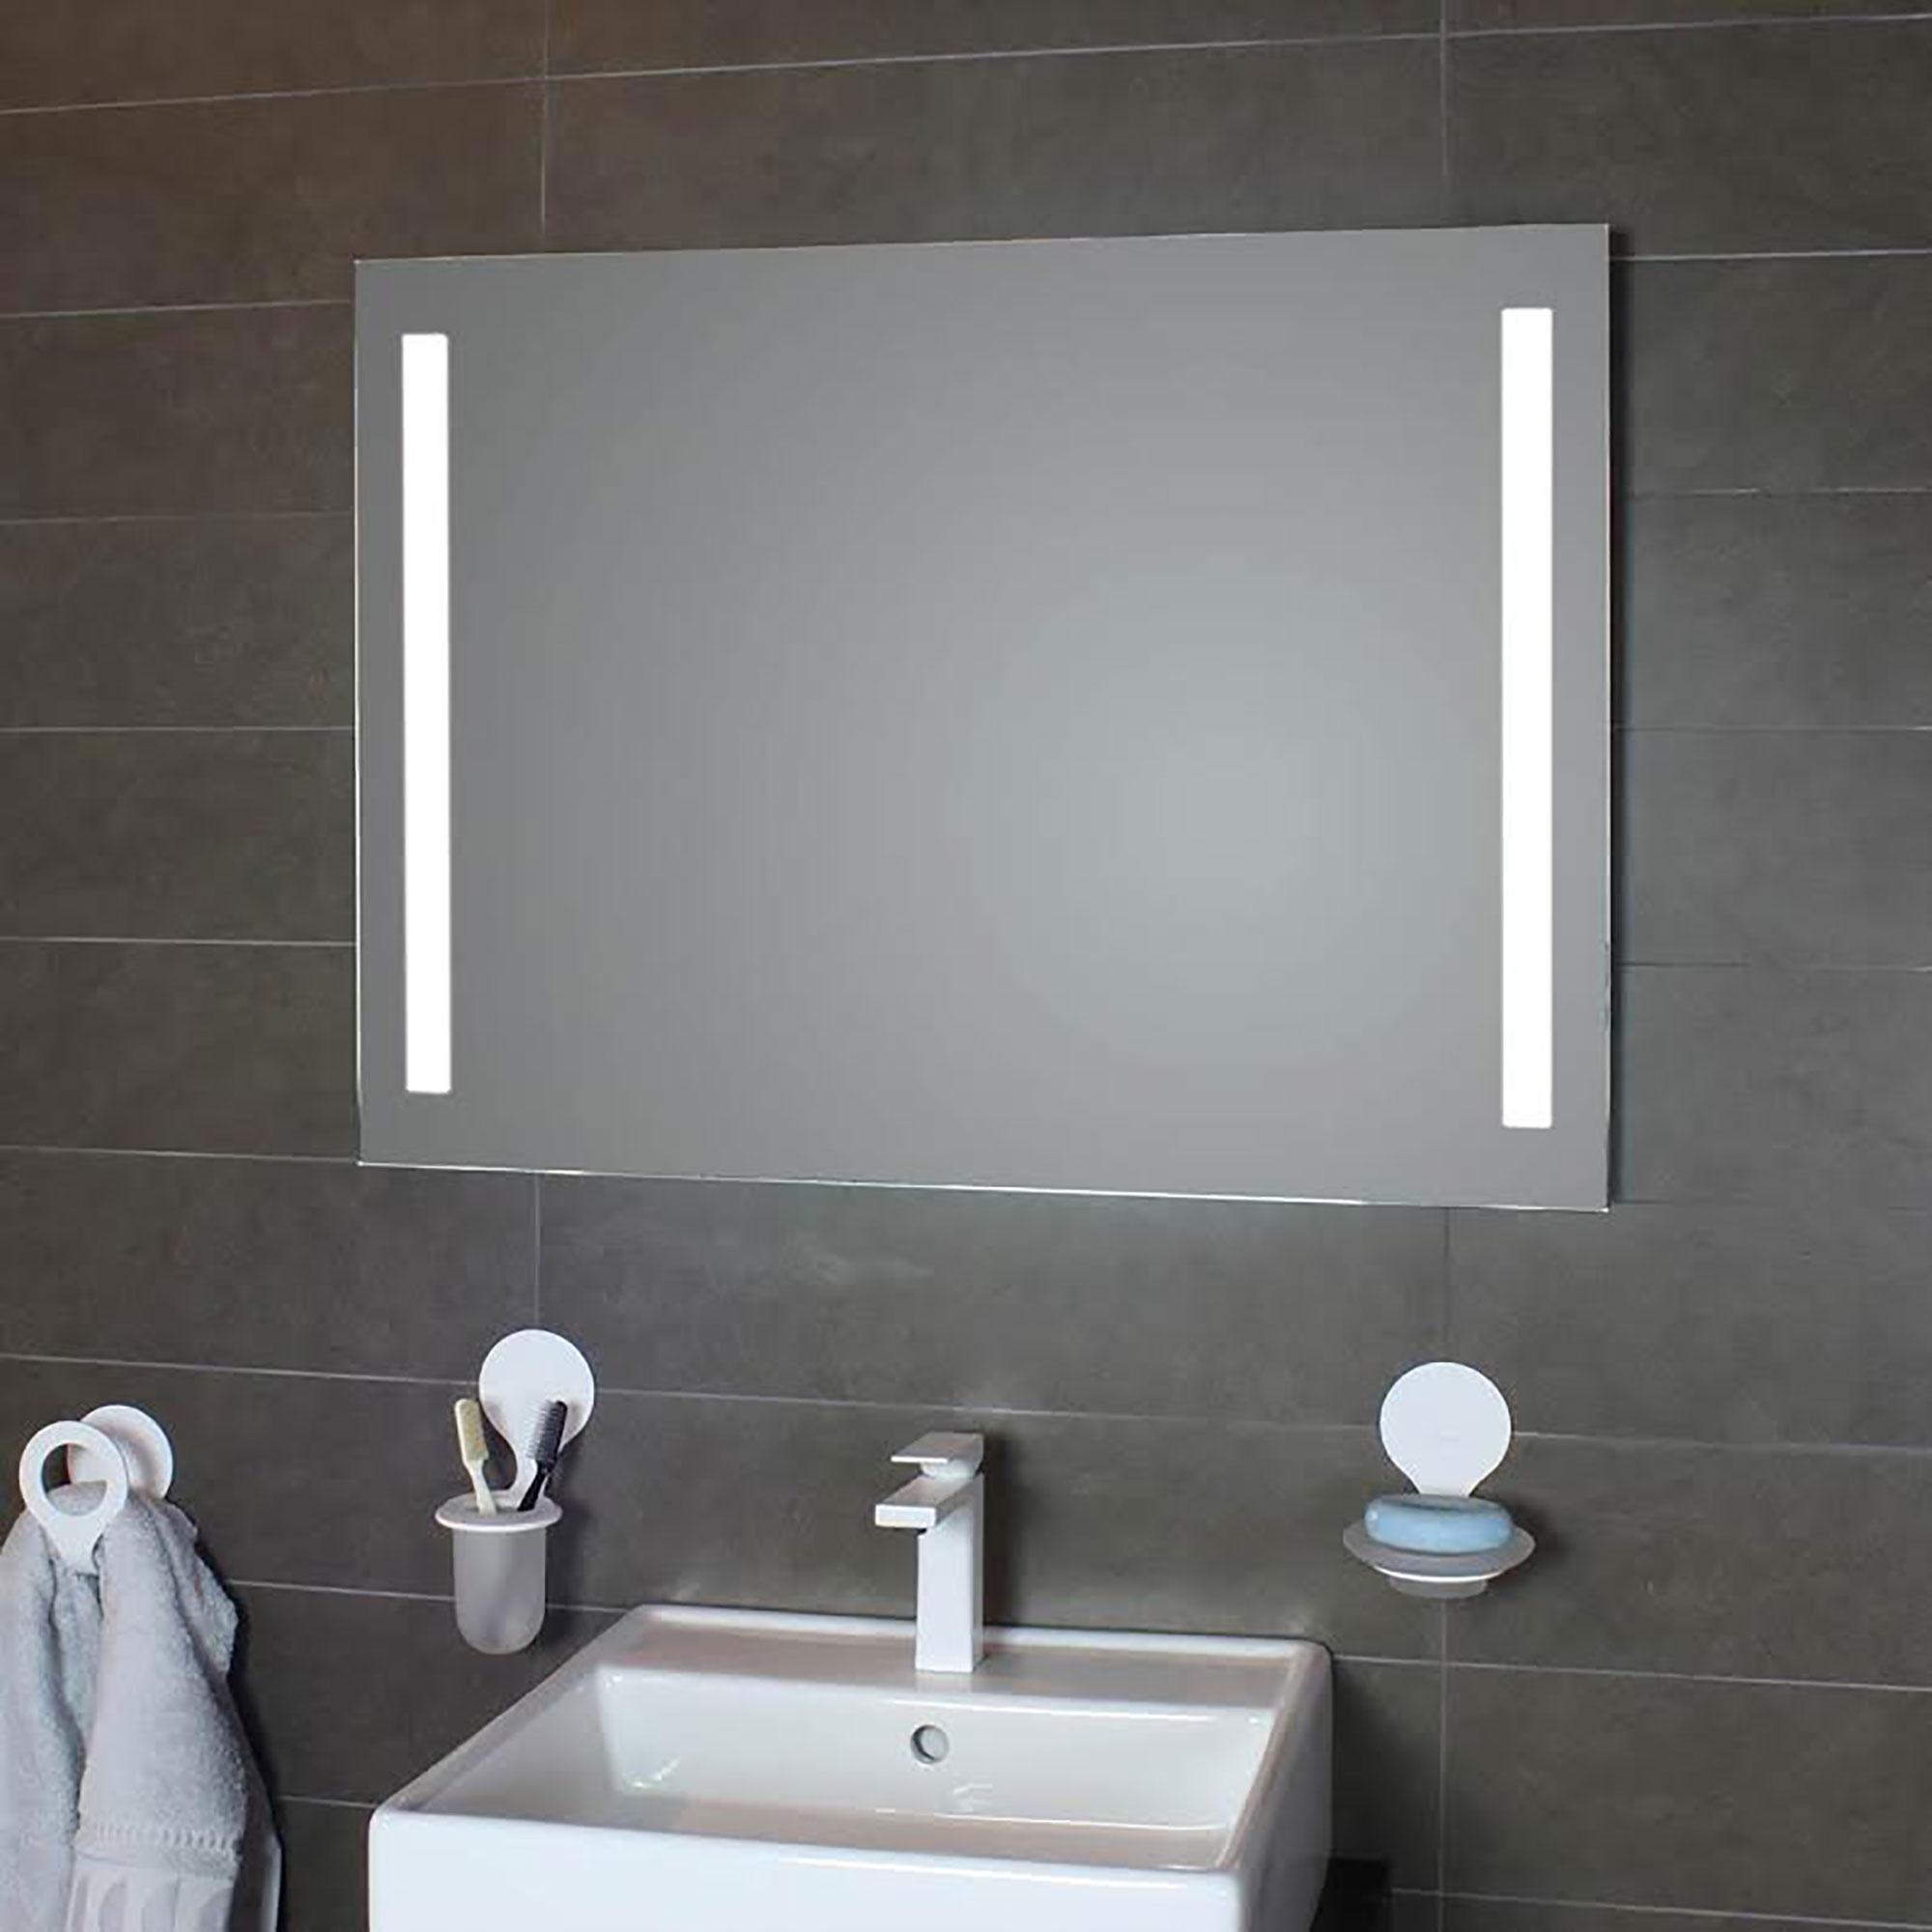 Ws Bath Collections Simply Led Lighted Bathroom Wall Mirror Simply L00200 L00300 L00600 Modo Bath